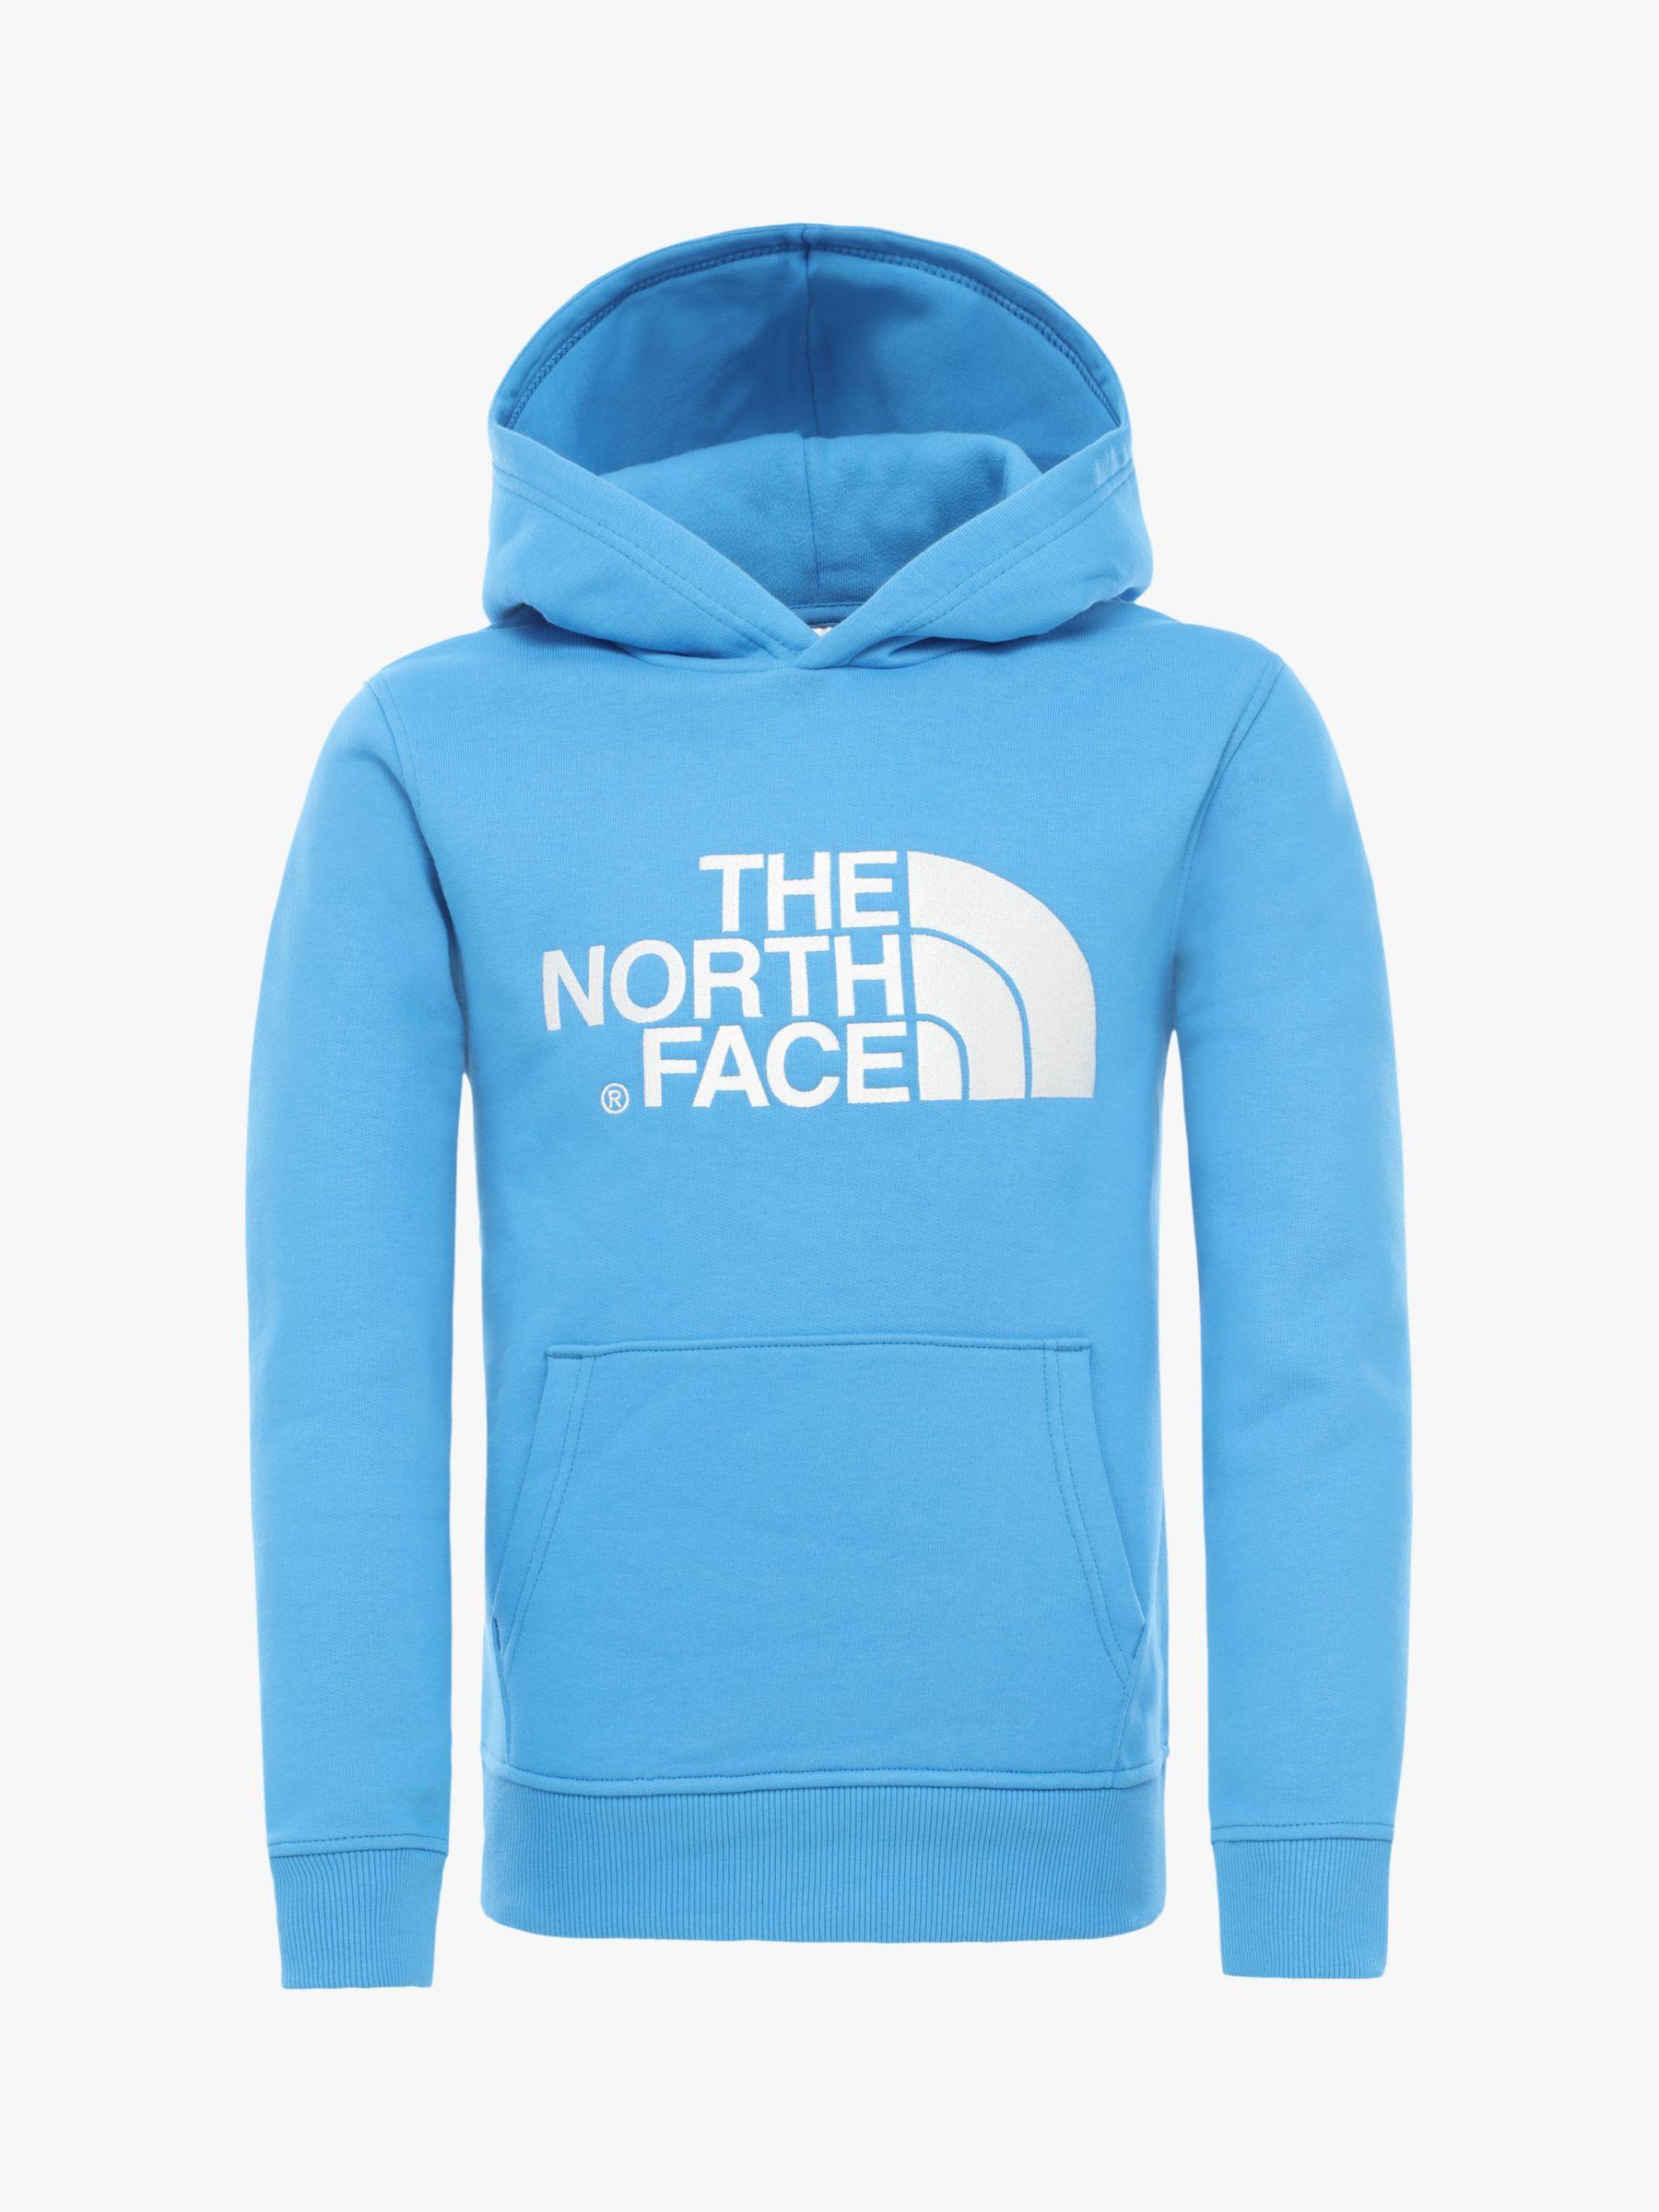 The North Face Boys Peak Hoodie Blue At John Lewis Partners